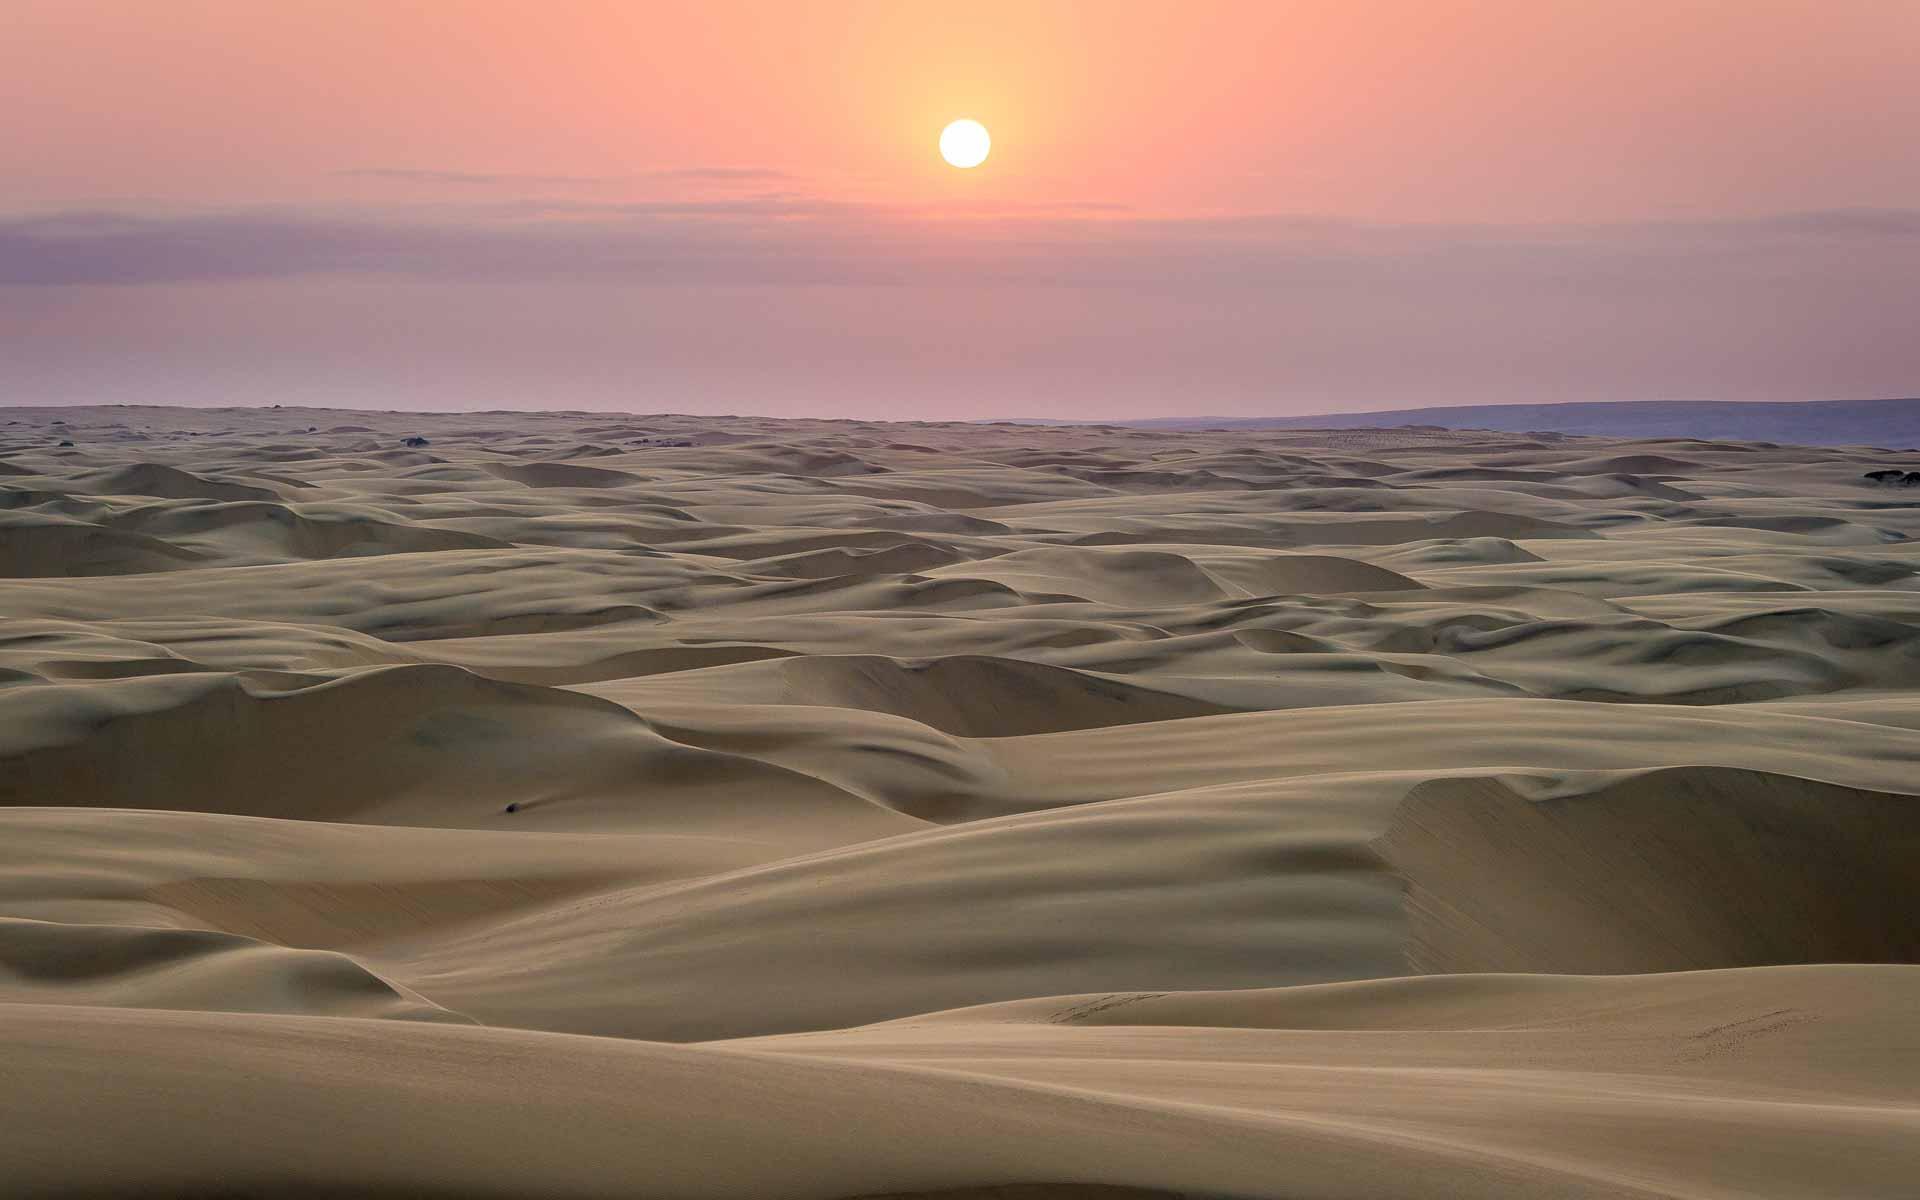 enkosi-africa-safari-namibia-kaokoland-kunene-serra-cafema-wilderness-sunset